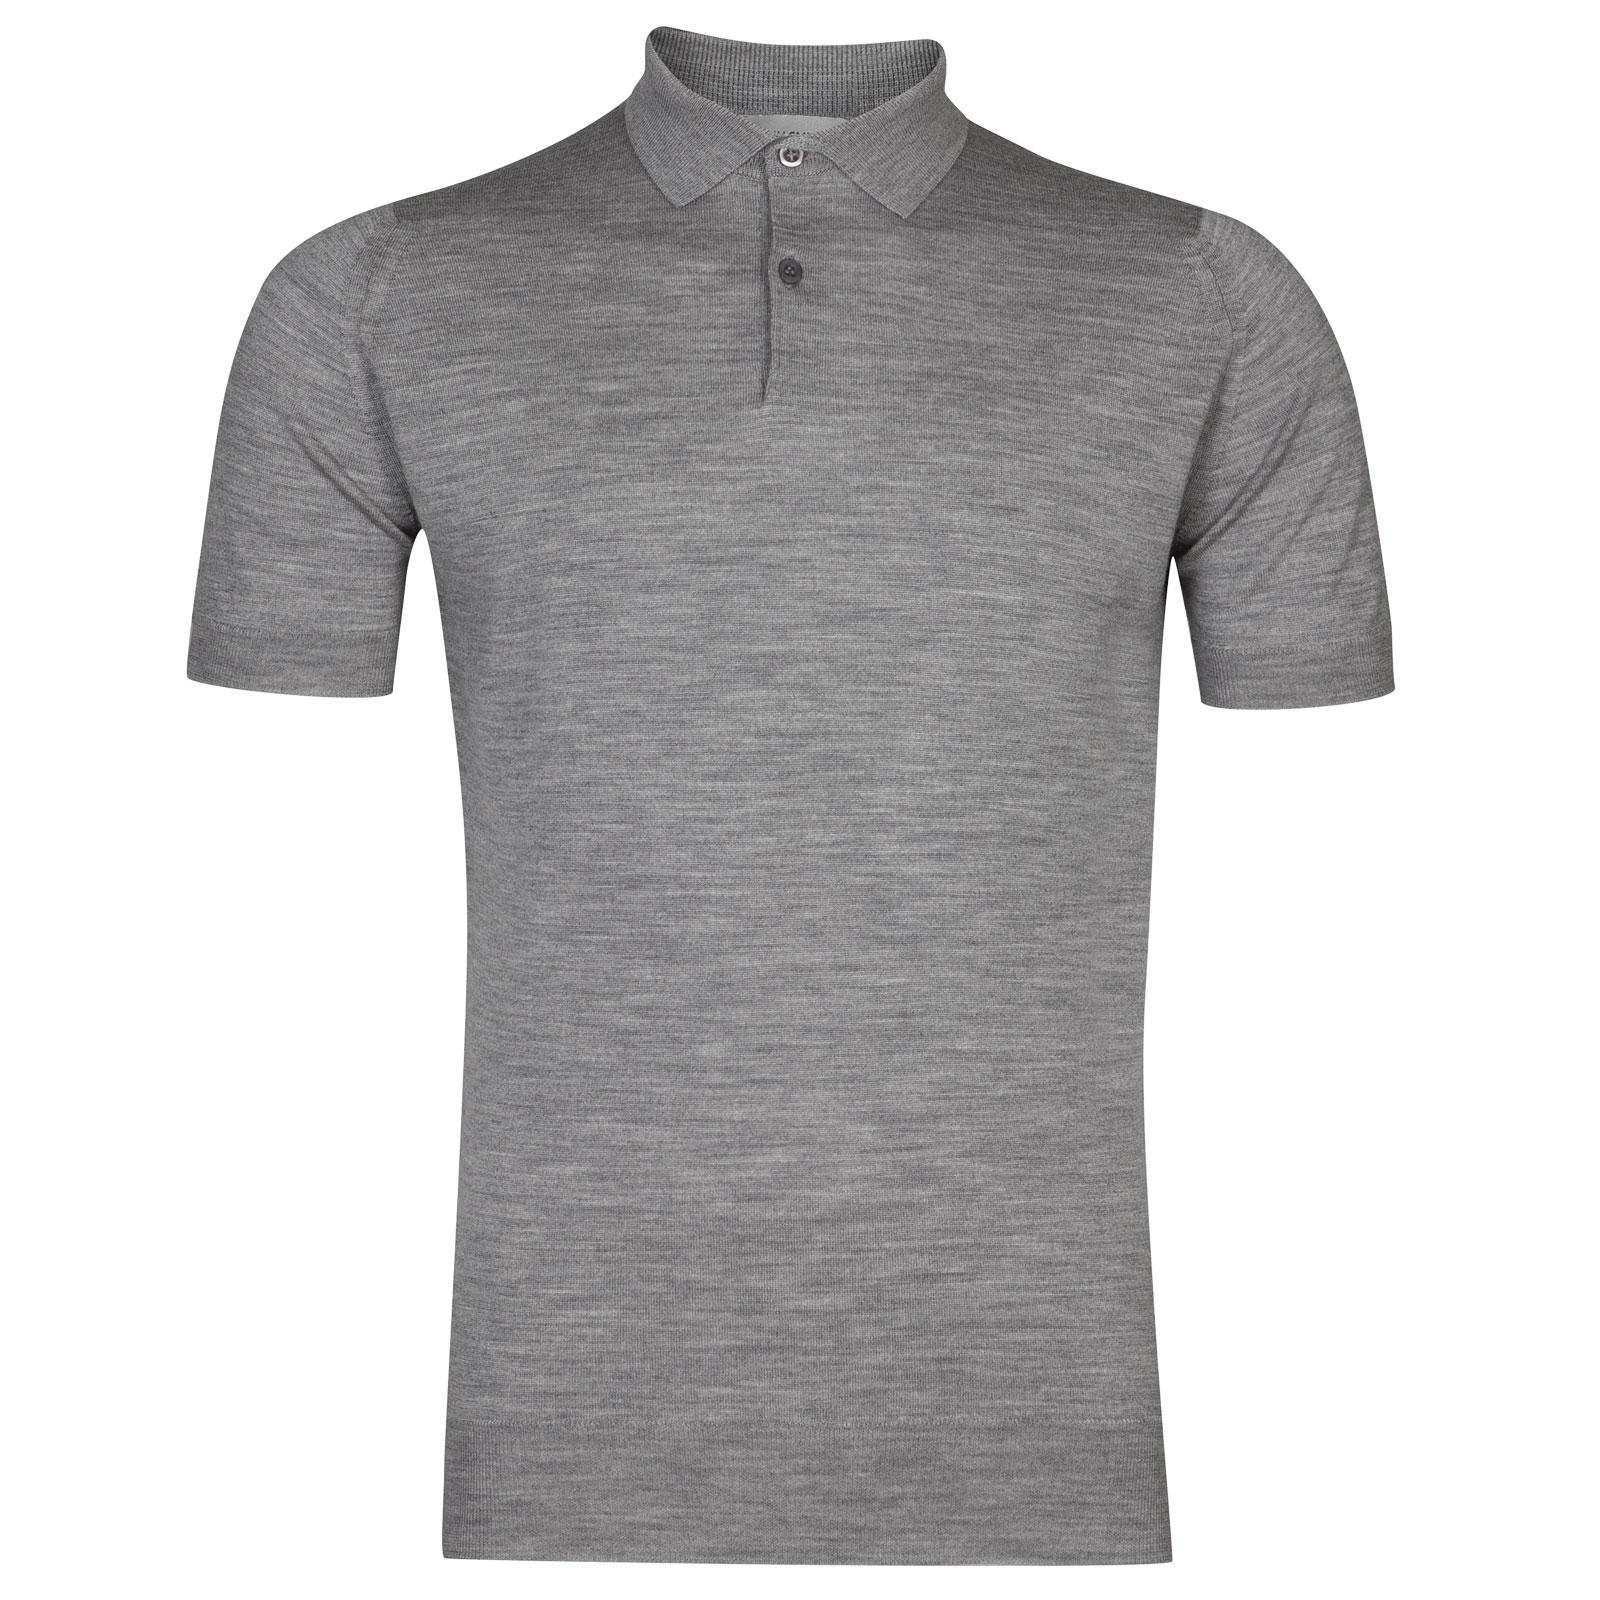 John Smedley payton Merino Wool Shirt in Silver-XXL